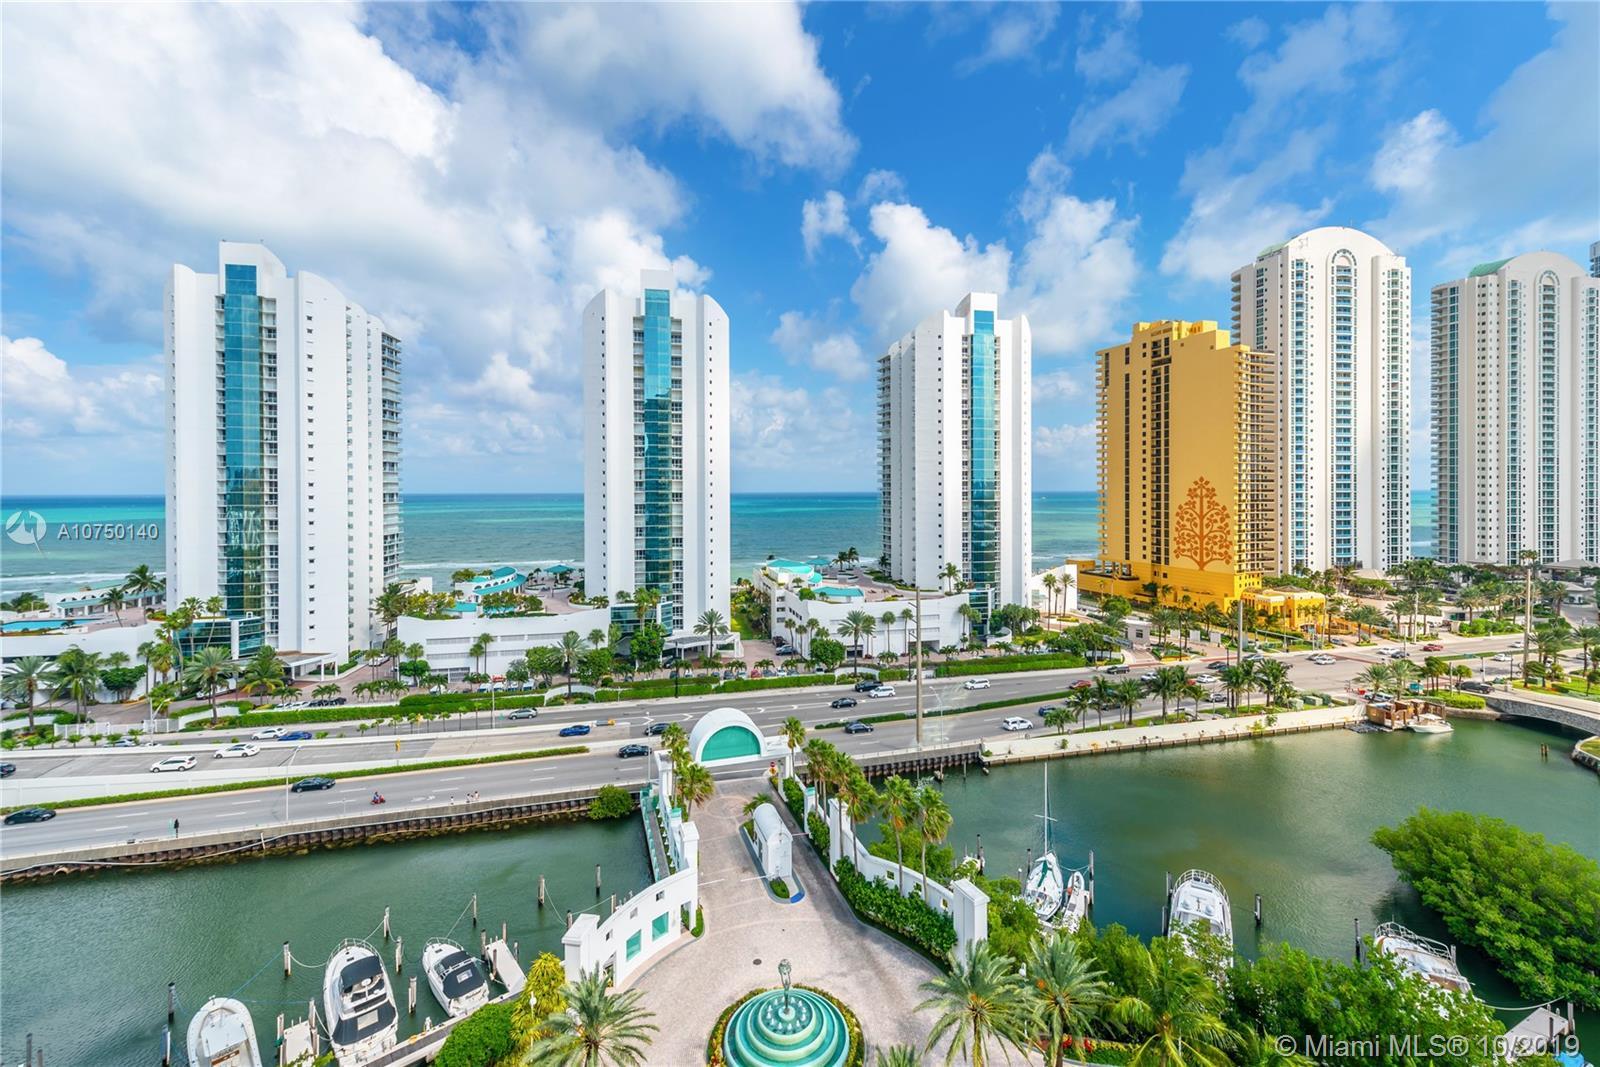 16400 collins ave 1541, Sunny Isles Beach, FL 33160